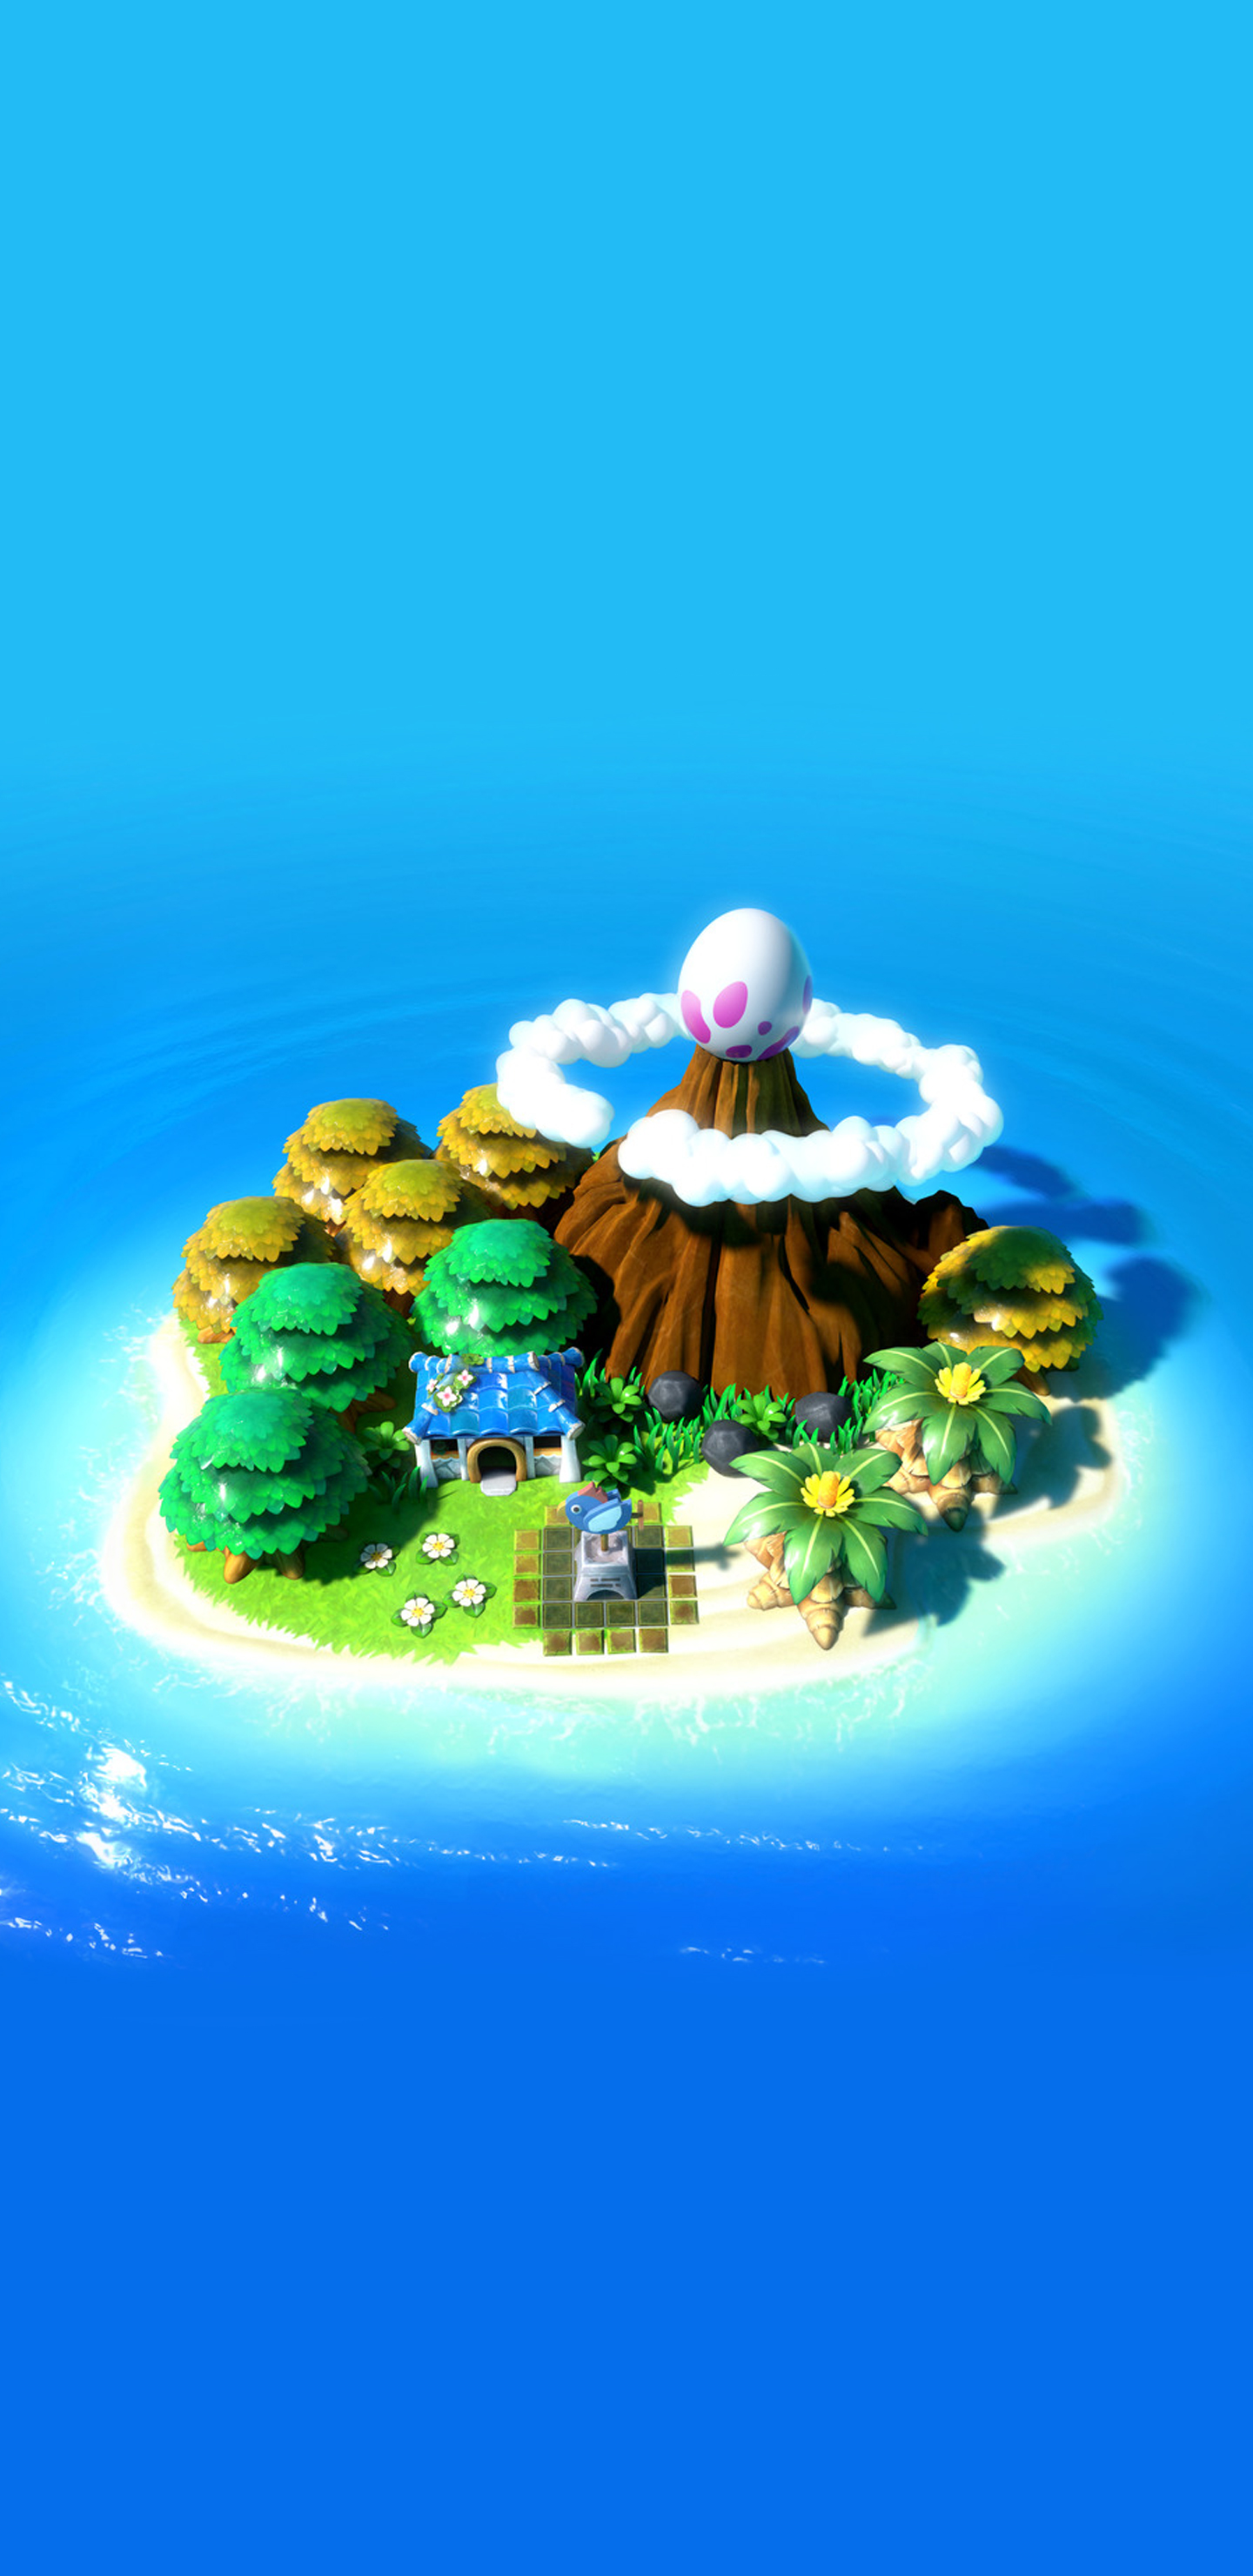 The Legend Of Zelda Link S Awakening Koholint Island No Logo Wallpaper Cat With Monocle